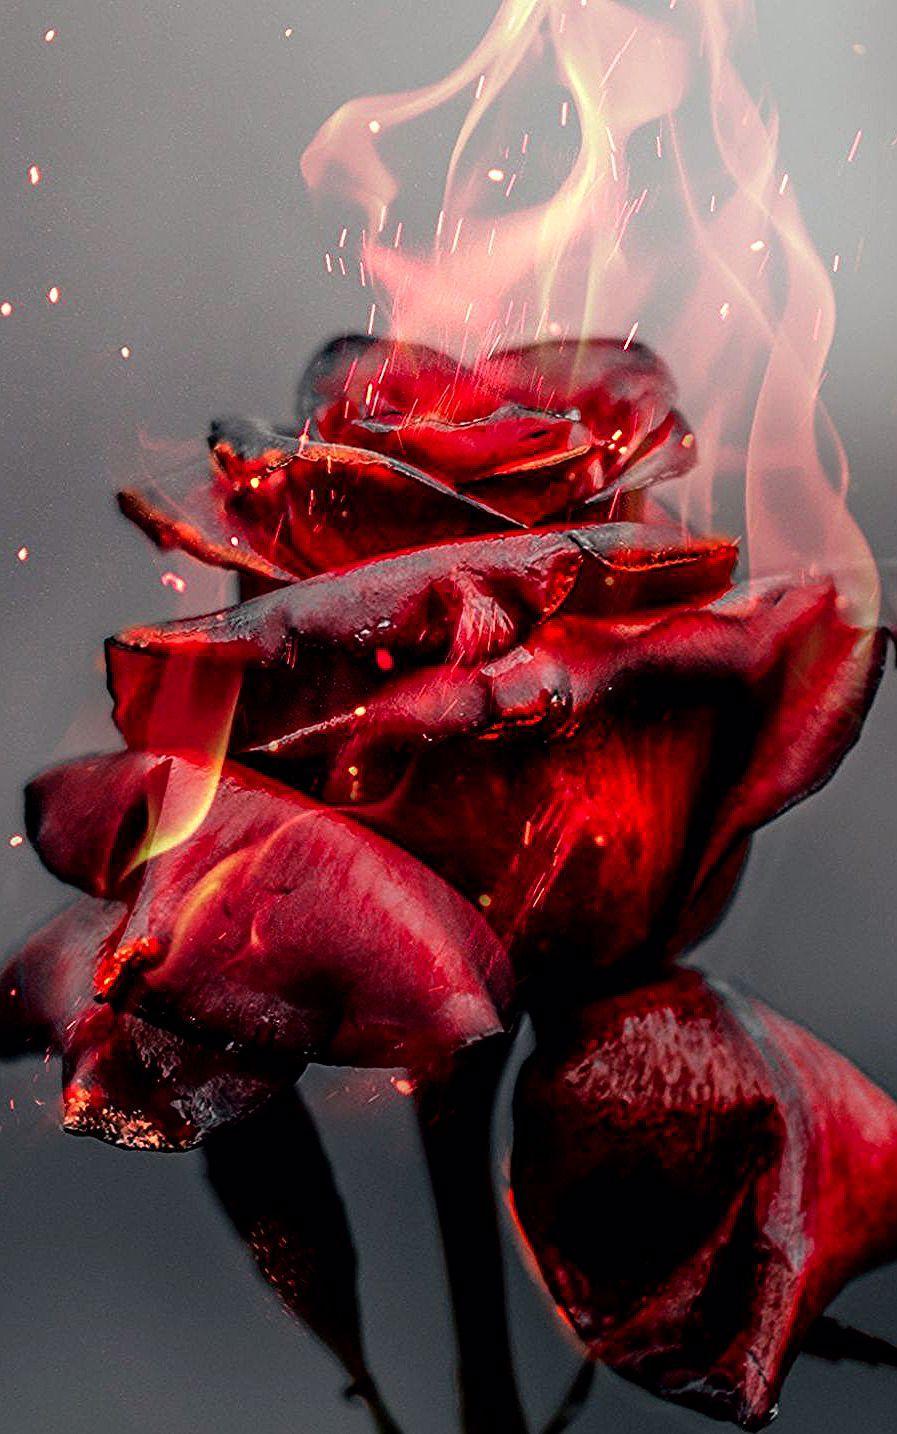 1080x1920 Burning Rose Fire Red Flower Wallpaper Red Roses Wallpaper Red Flower Wallpaper Burning Rose